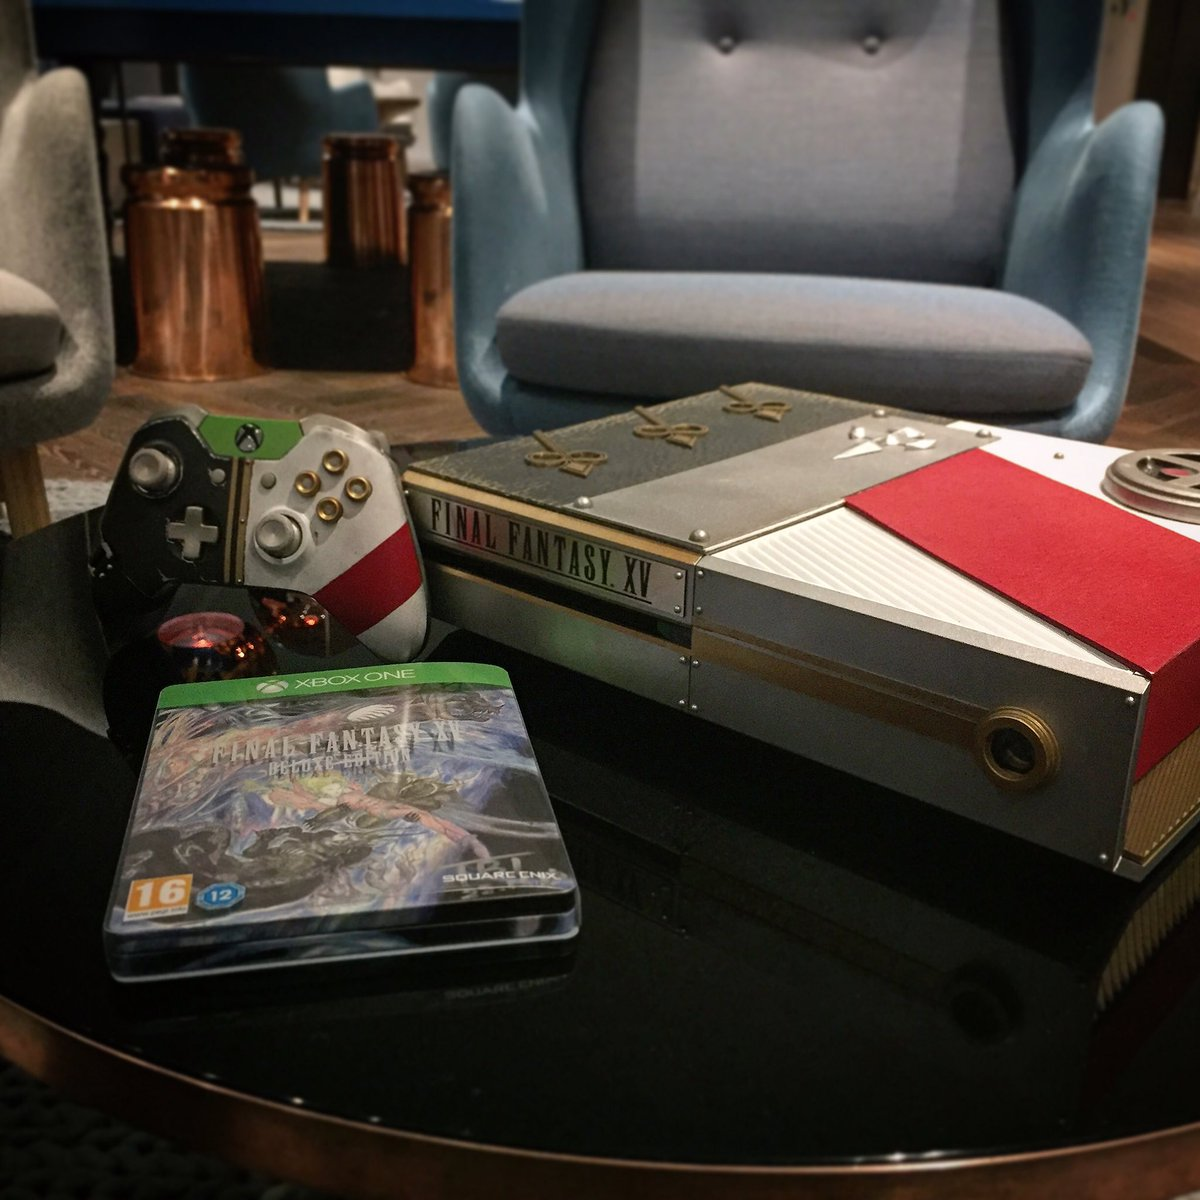 RT if you think we should giveaway this custom Final Fantasy XV console: https://t.co/mxZ3KQmlUM 🎮❤️ https://t.co/dw1Ka2Iyo4